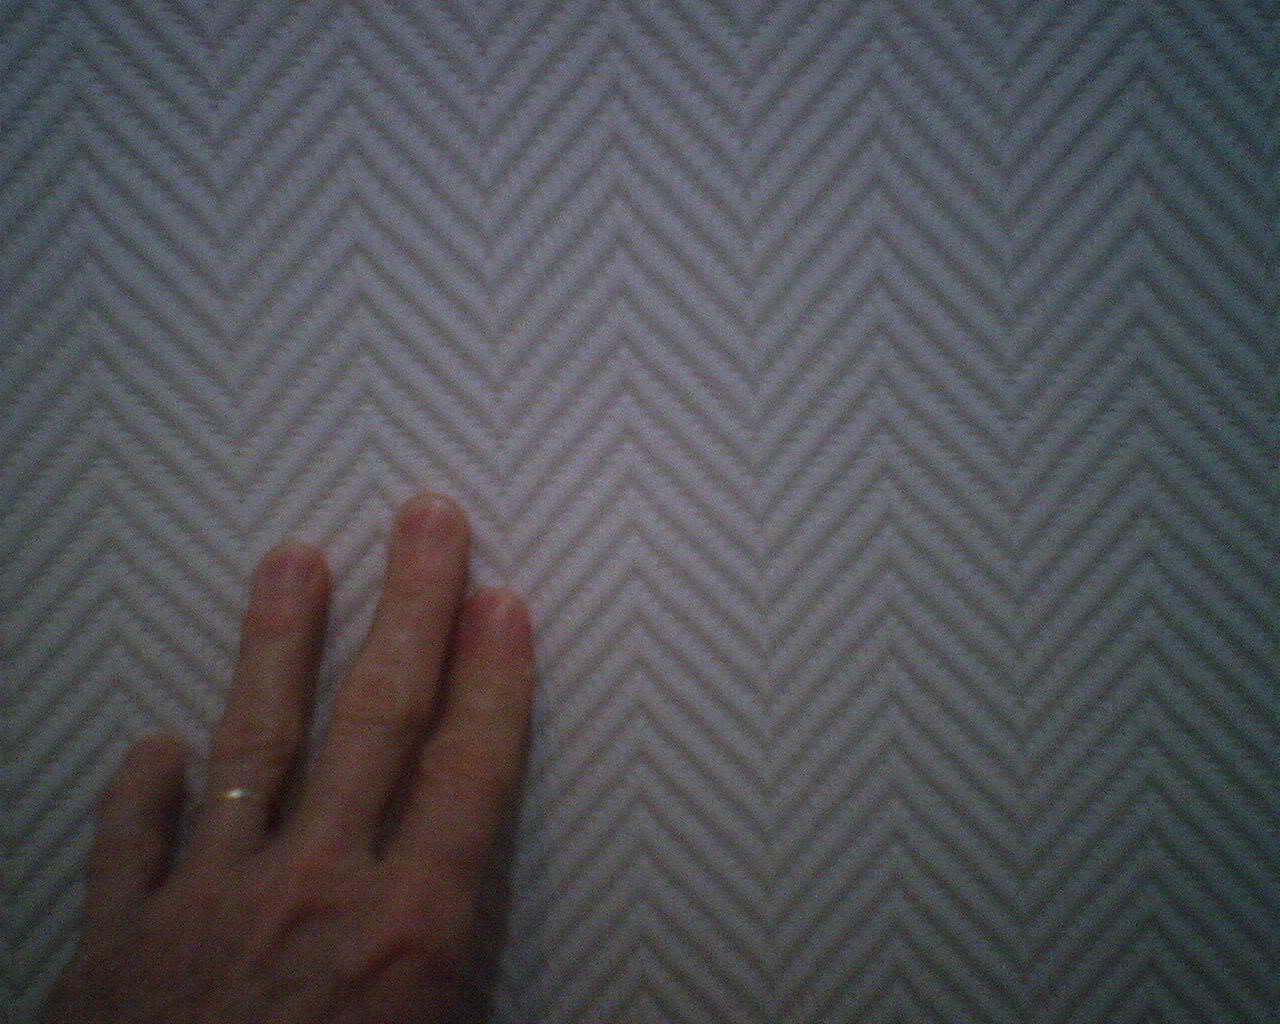 Anaglypta Textured Wallpaper Tough Day at Work Today 1280x1024